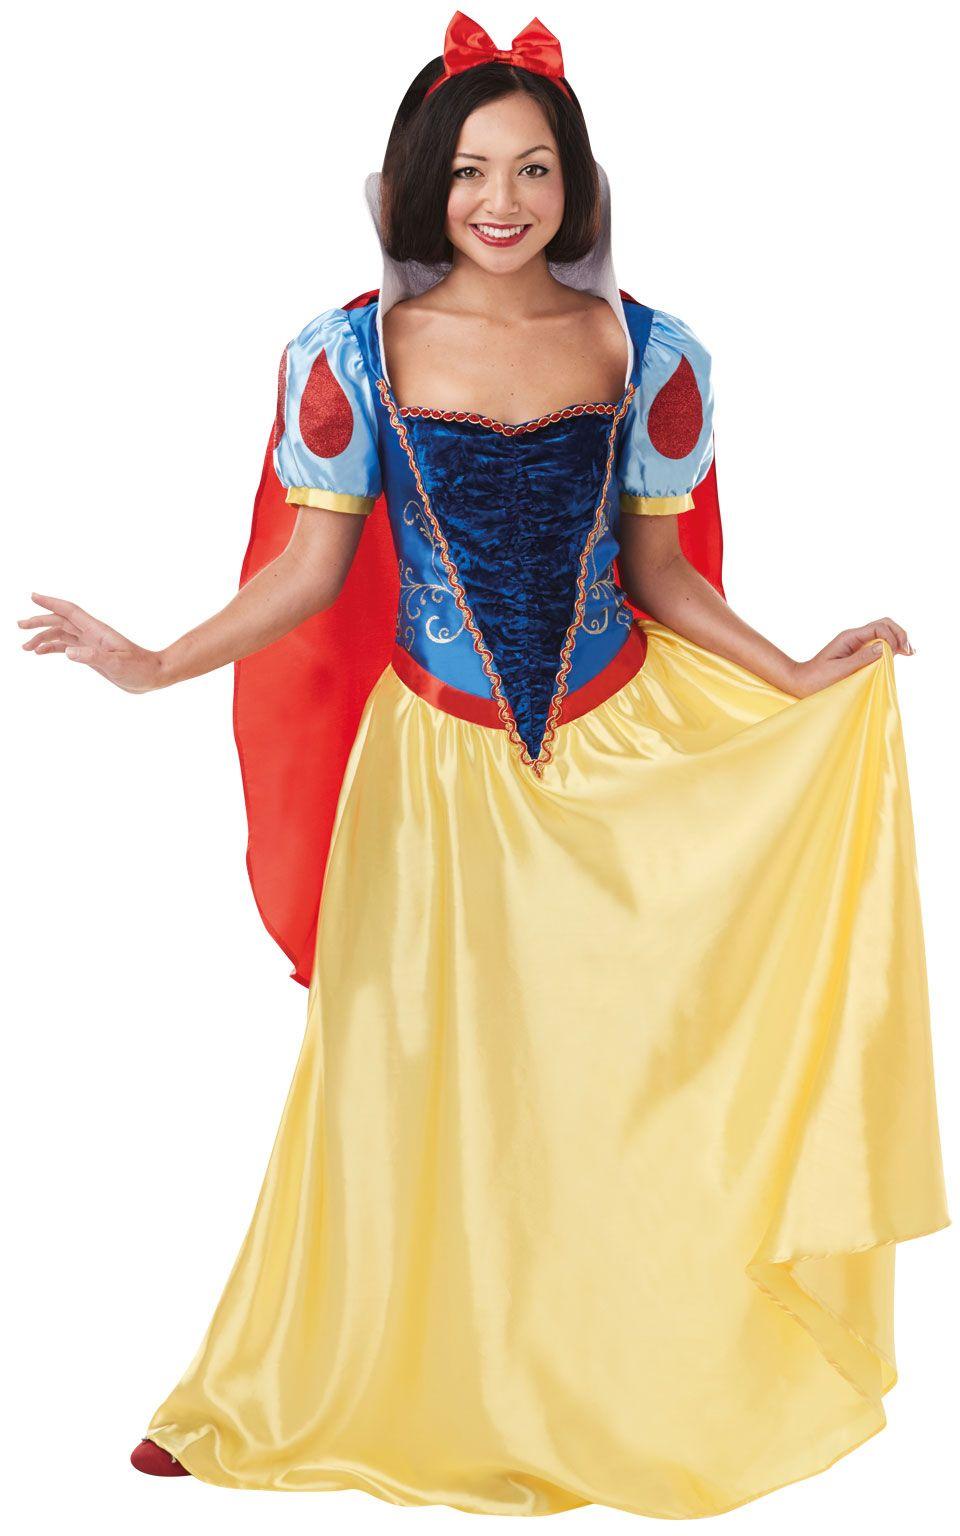 Shrek Princess Fiona Costume Girls Licensed Book Week Kids Fancy Dress Outfit